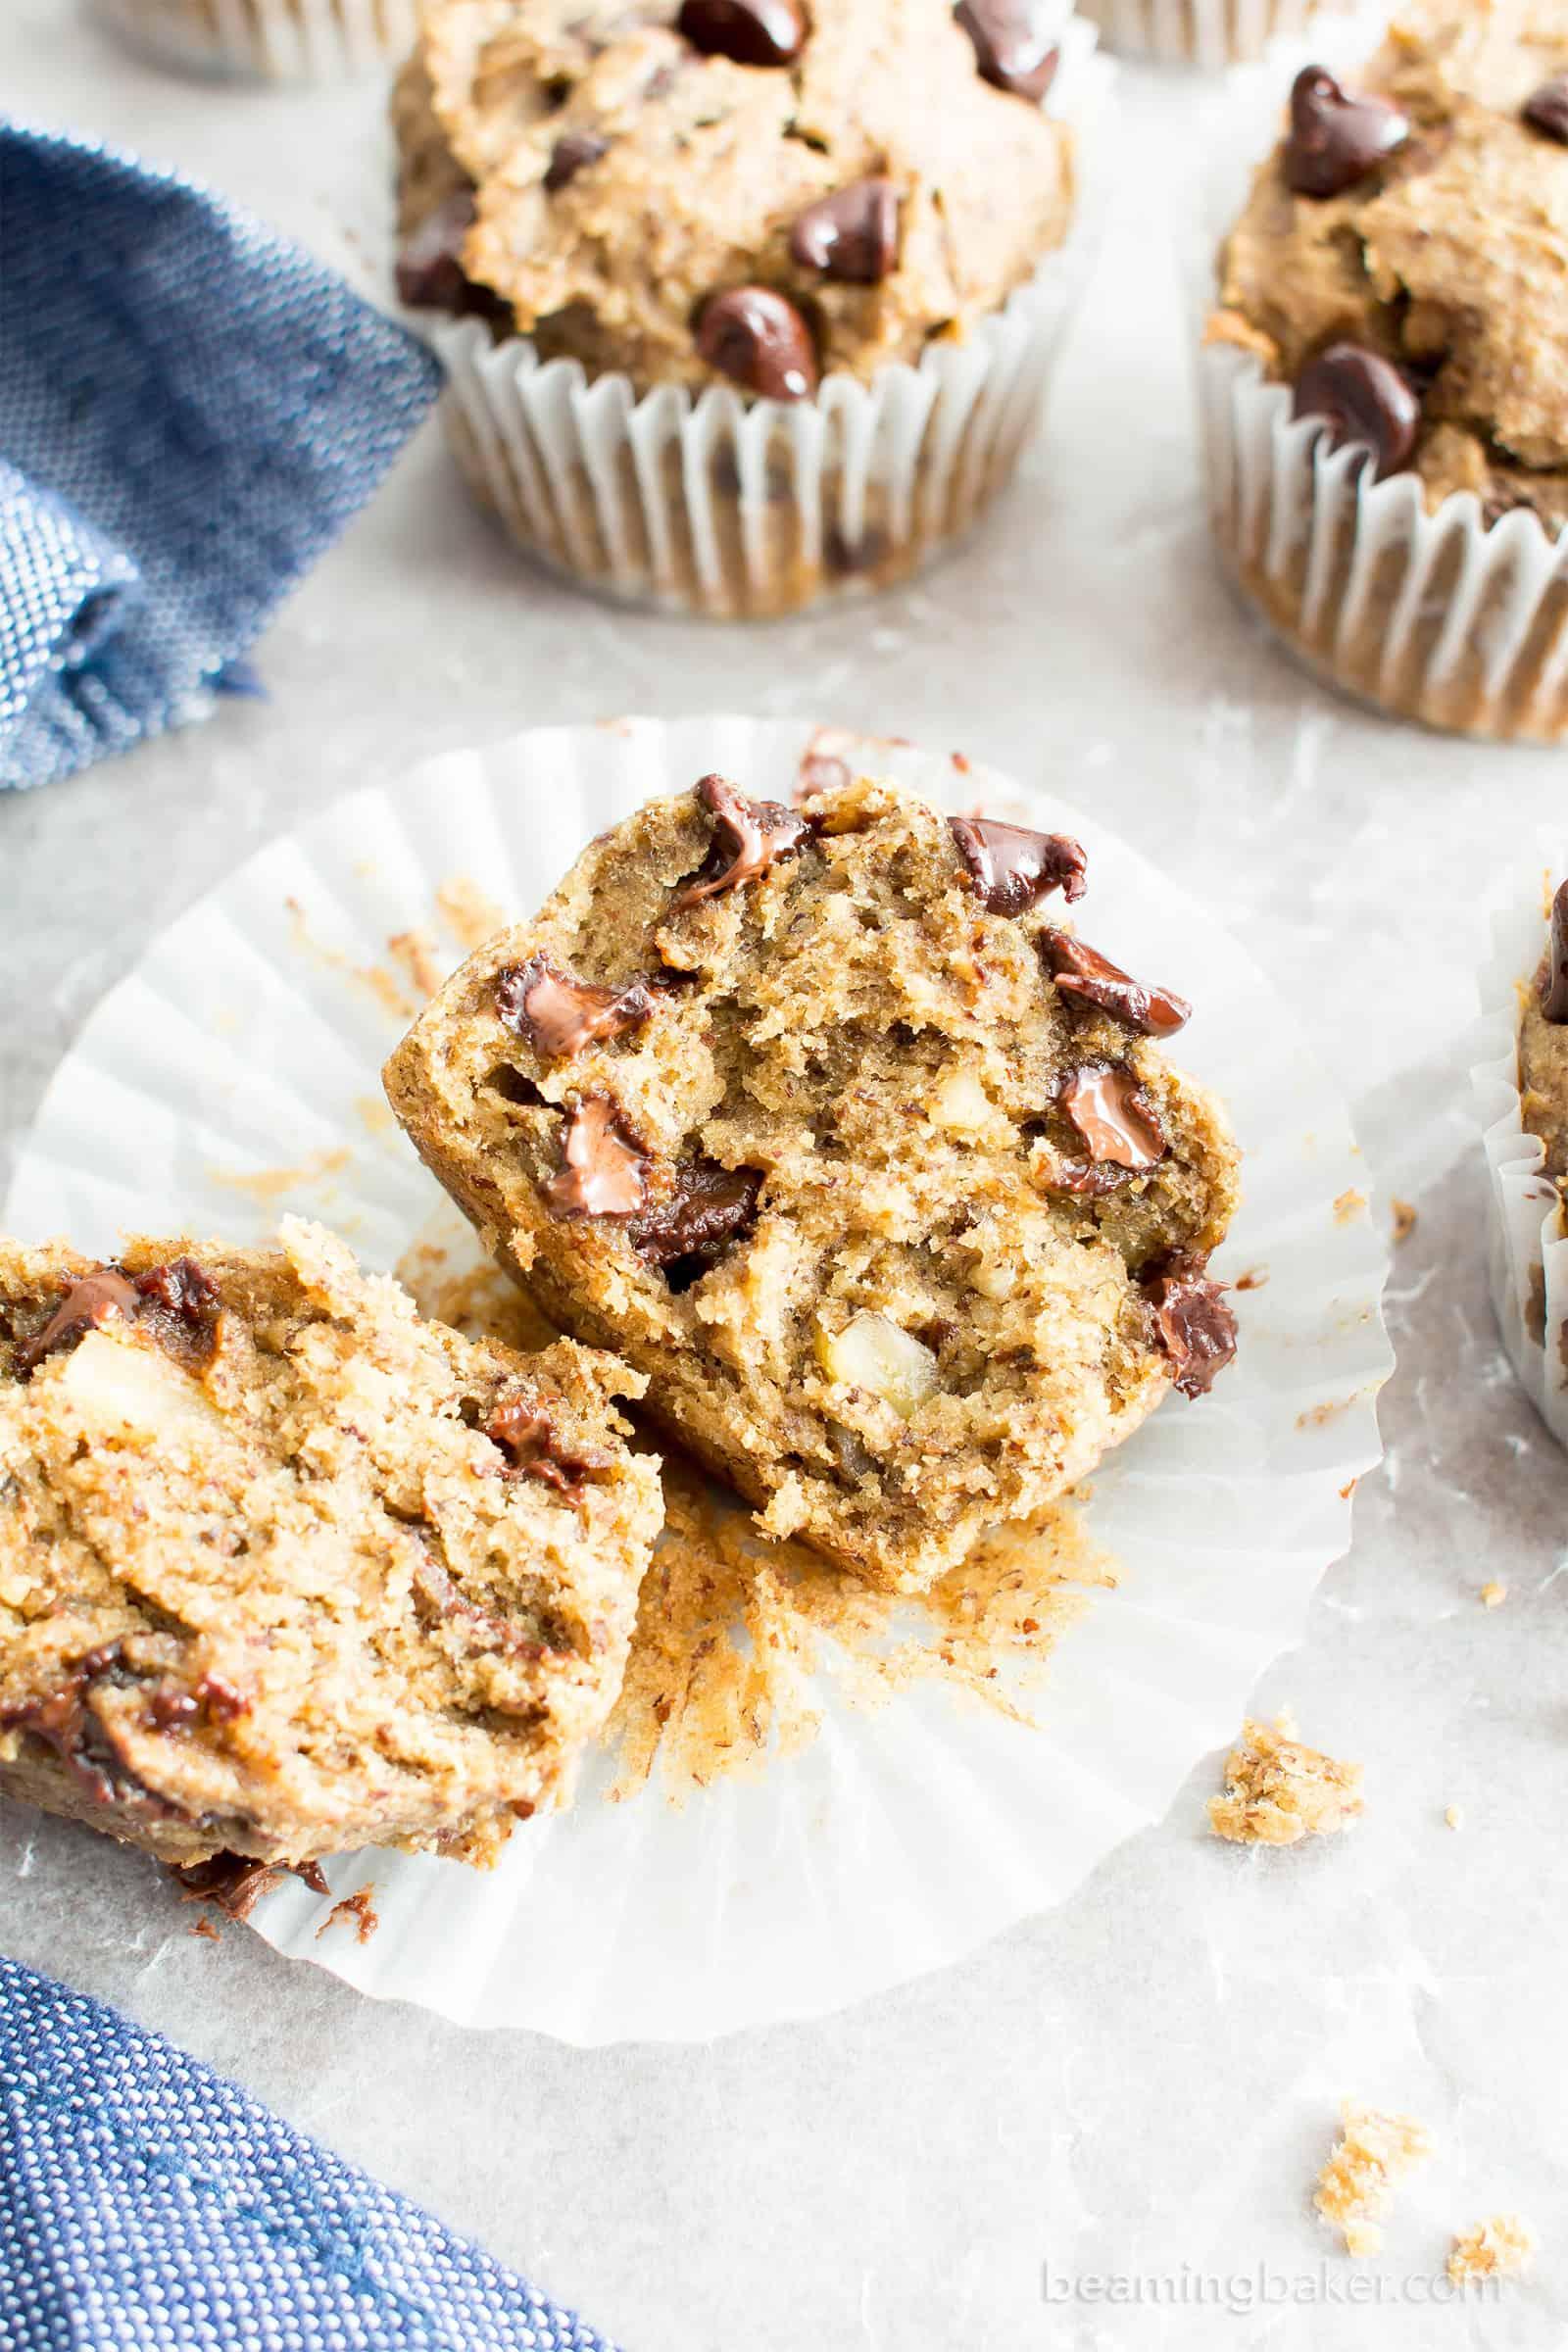 Moist Banana Chocolate Chip Muffins (V, GF): a one bowl recipe for perfectly moist banana muffins bursting with chocolate chips! #Vegan #GlutenFree #DairyFree #Breakfast #Dessert | Recipe on BeamingBaker.com